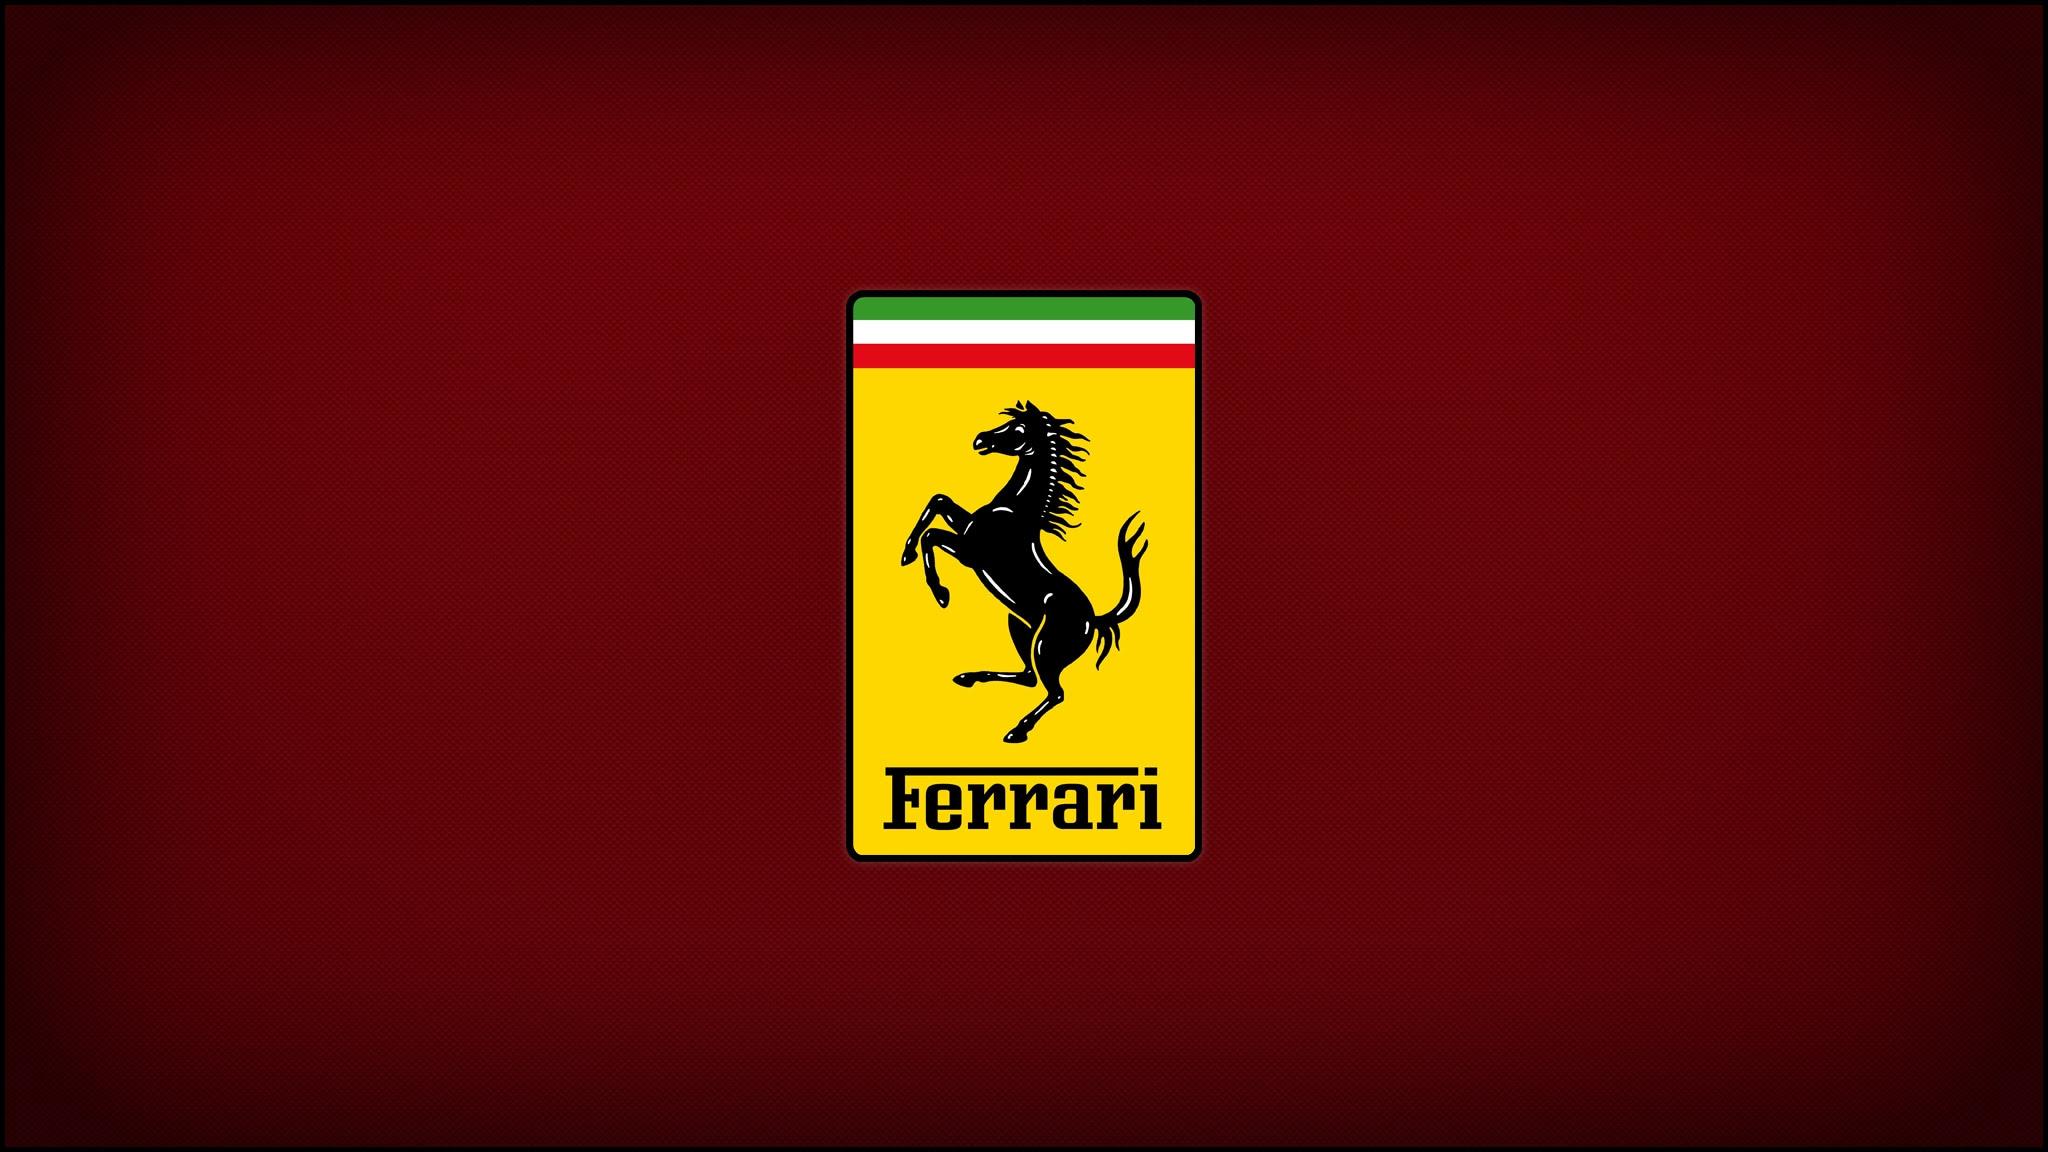 Ferrari: Branding as easy as Formula 1, 2, 3  AERON BRAND INNOVATION \u0026 DESIGN